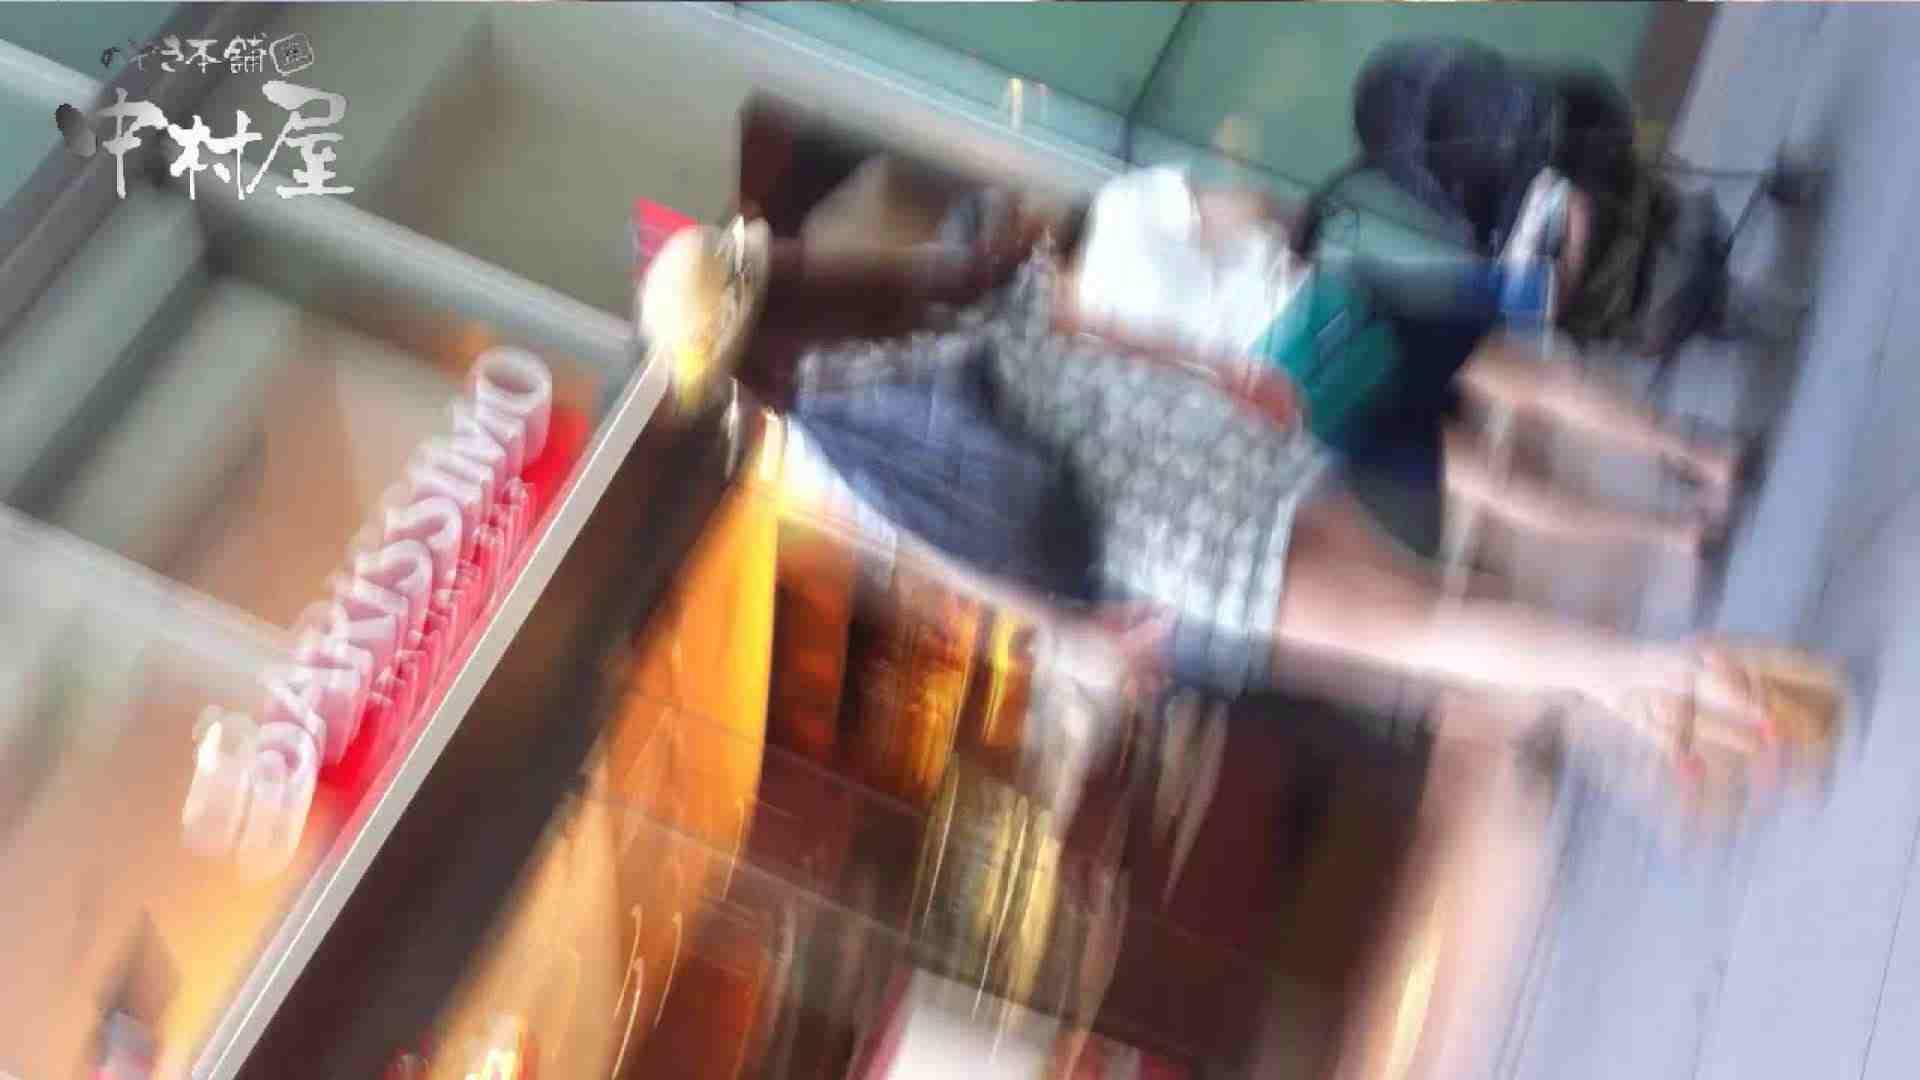 vol.65 美人アパレル胸チラ&パンチラ ムッチリ感がいい感じ花がらパンツさん チラ見えで興奮 おまんこ無修正動画無料 9枚 6